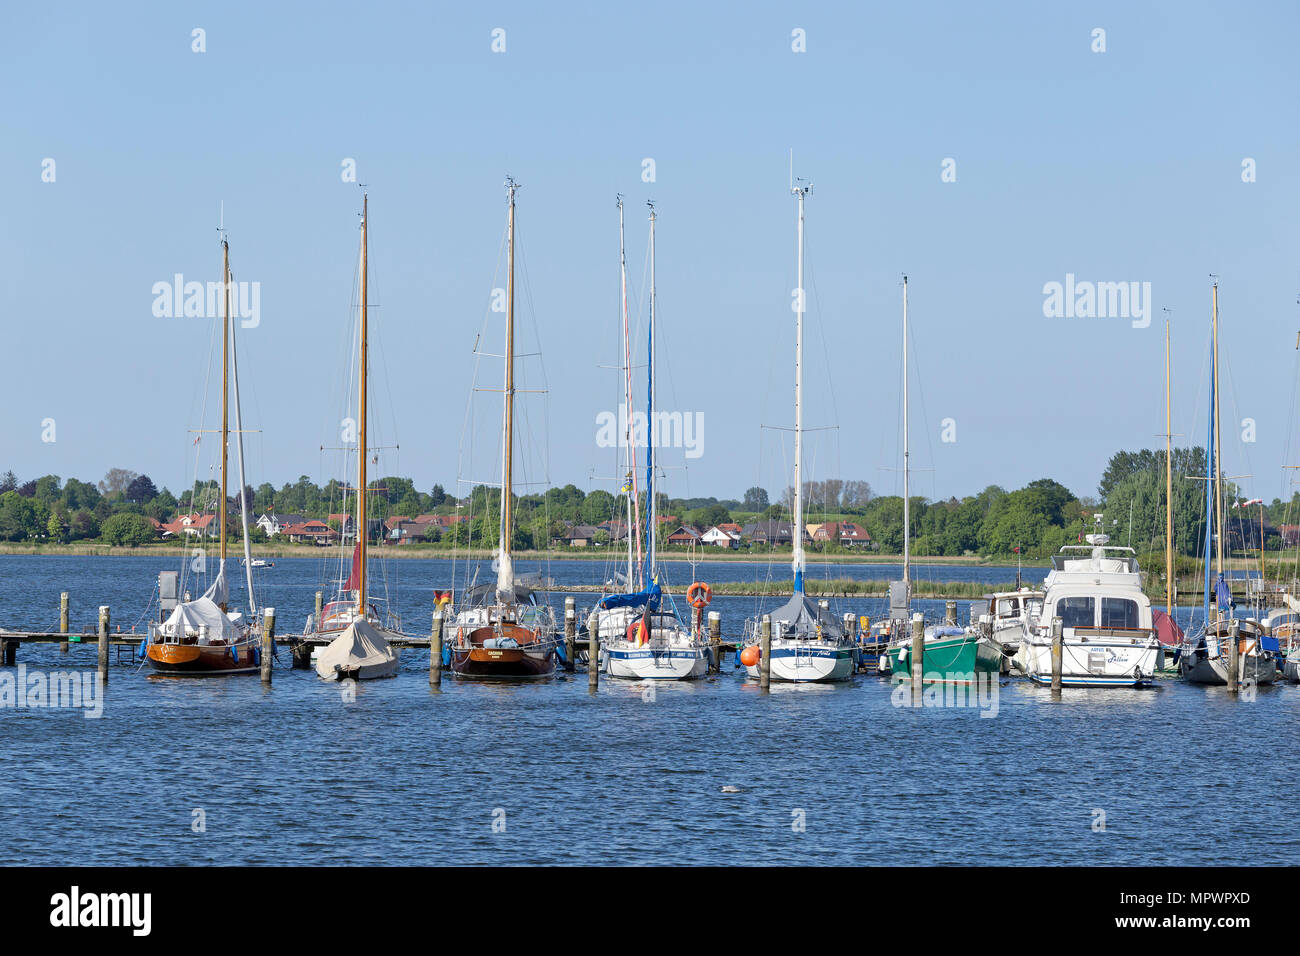 marina, Arnis, Schlei, Schleswig-Holstein, Germany - Stock Image